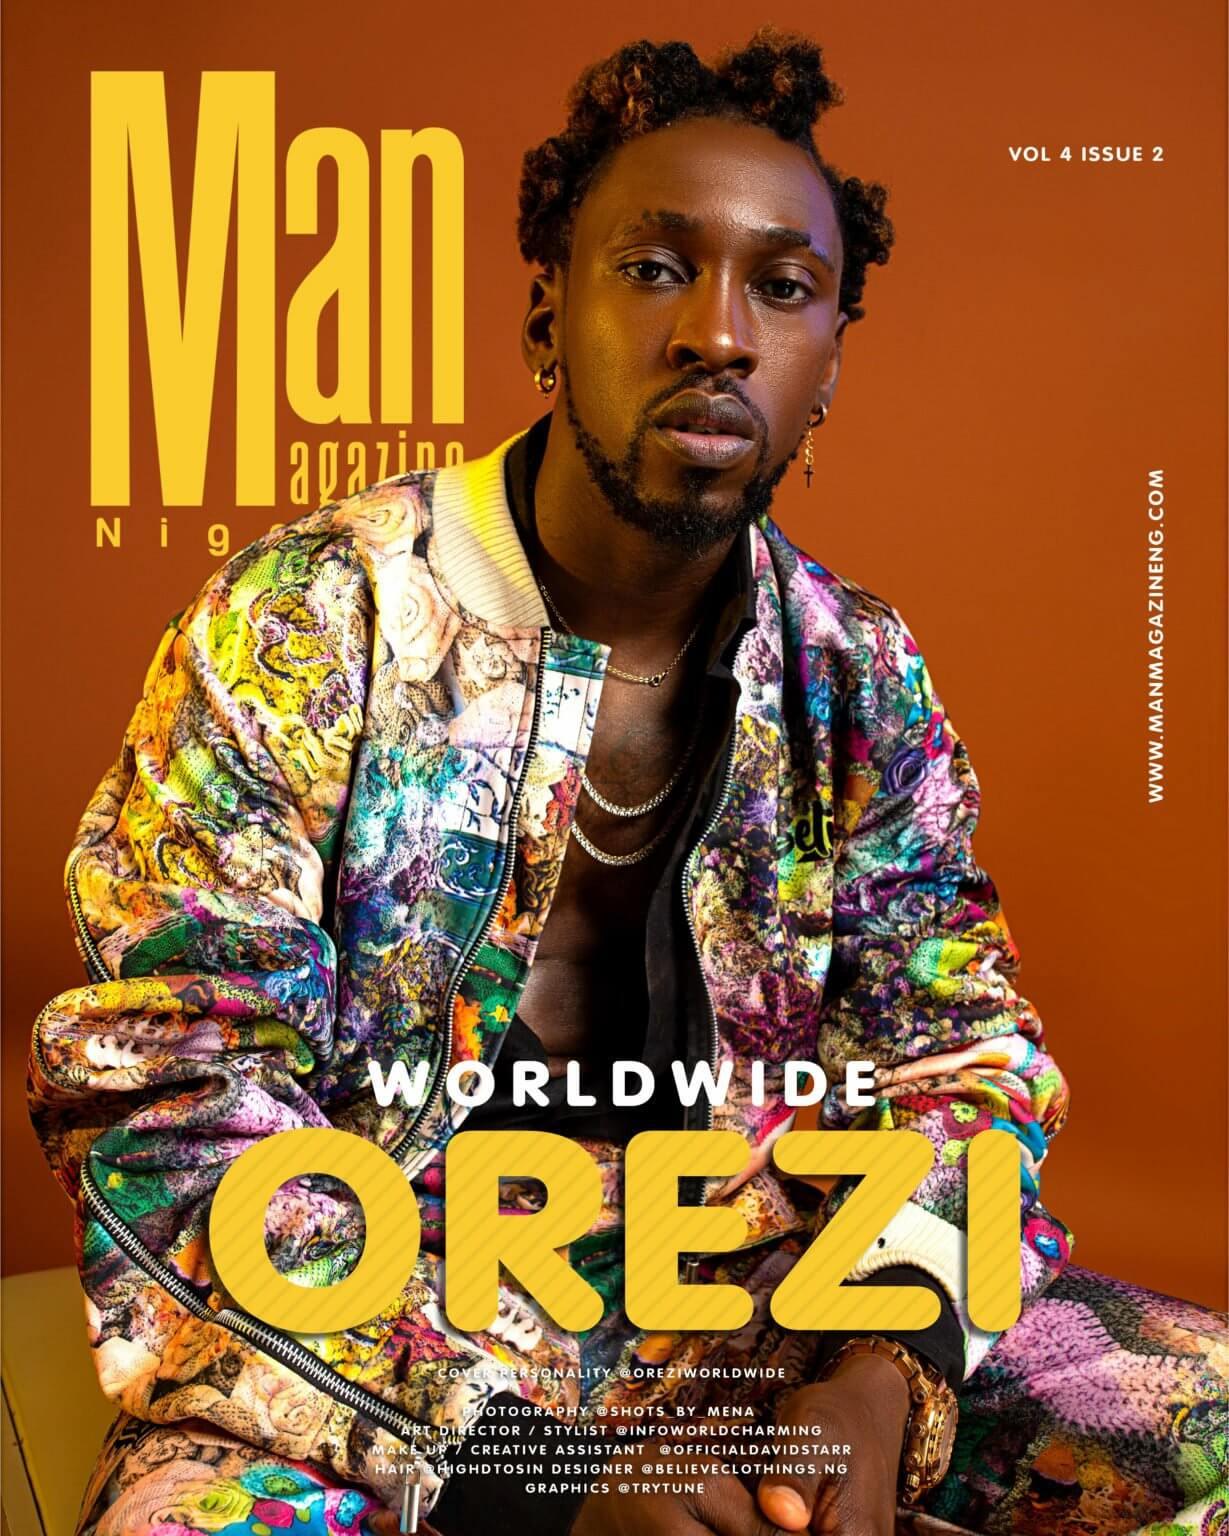 3orezi shows us the modern way to rock prints on man magazines new cover 1229x15361859492662625426891 1